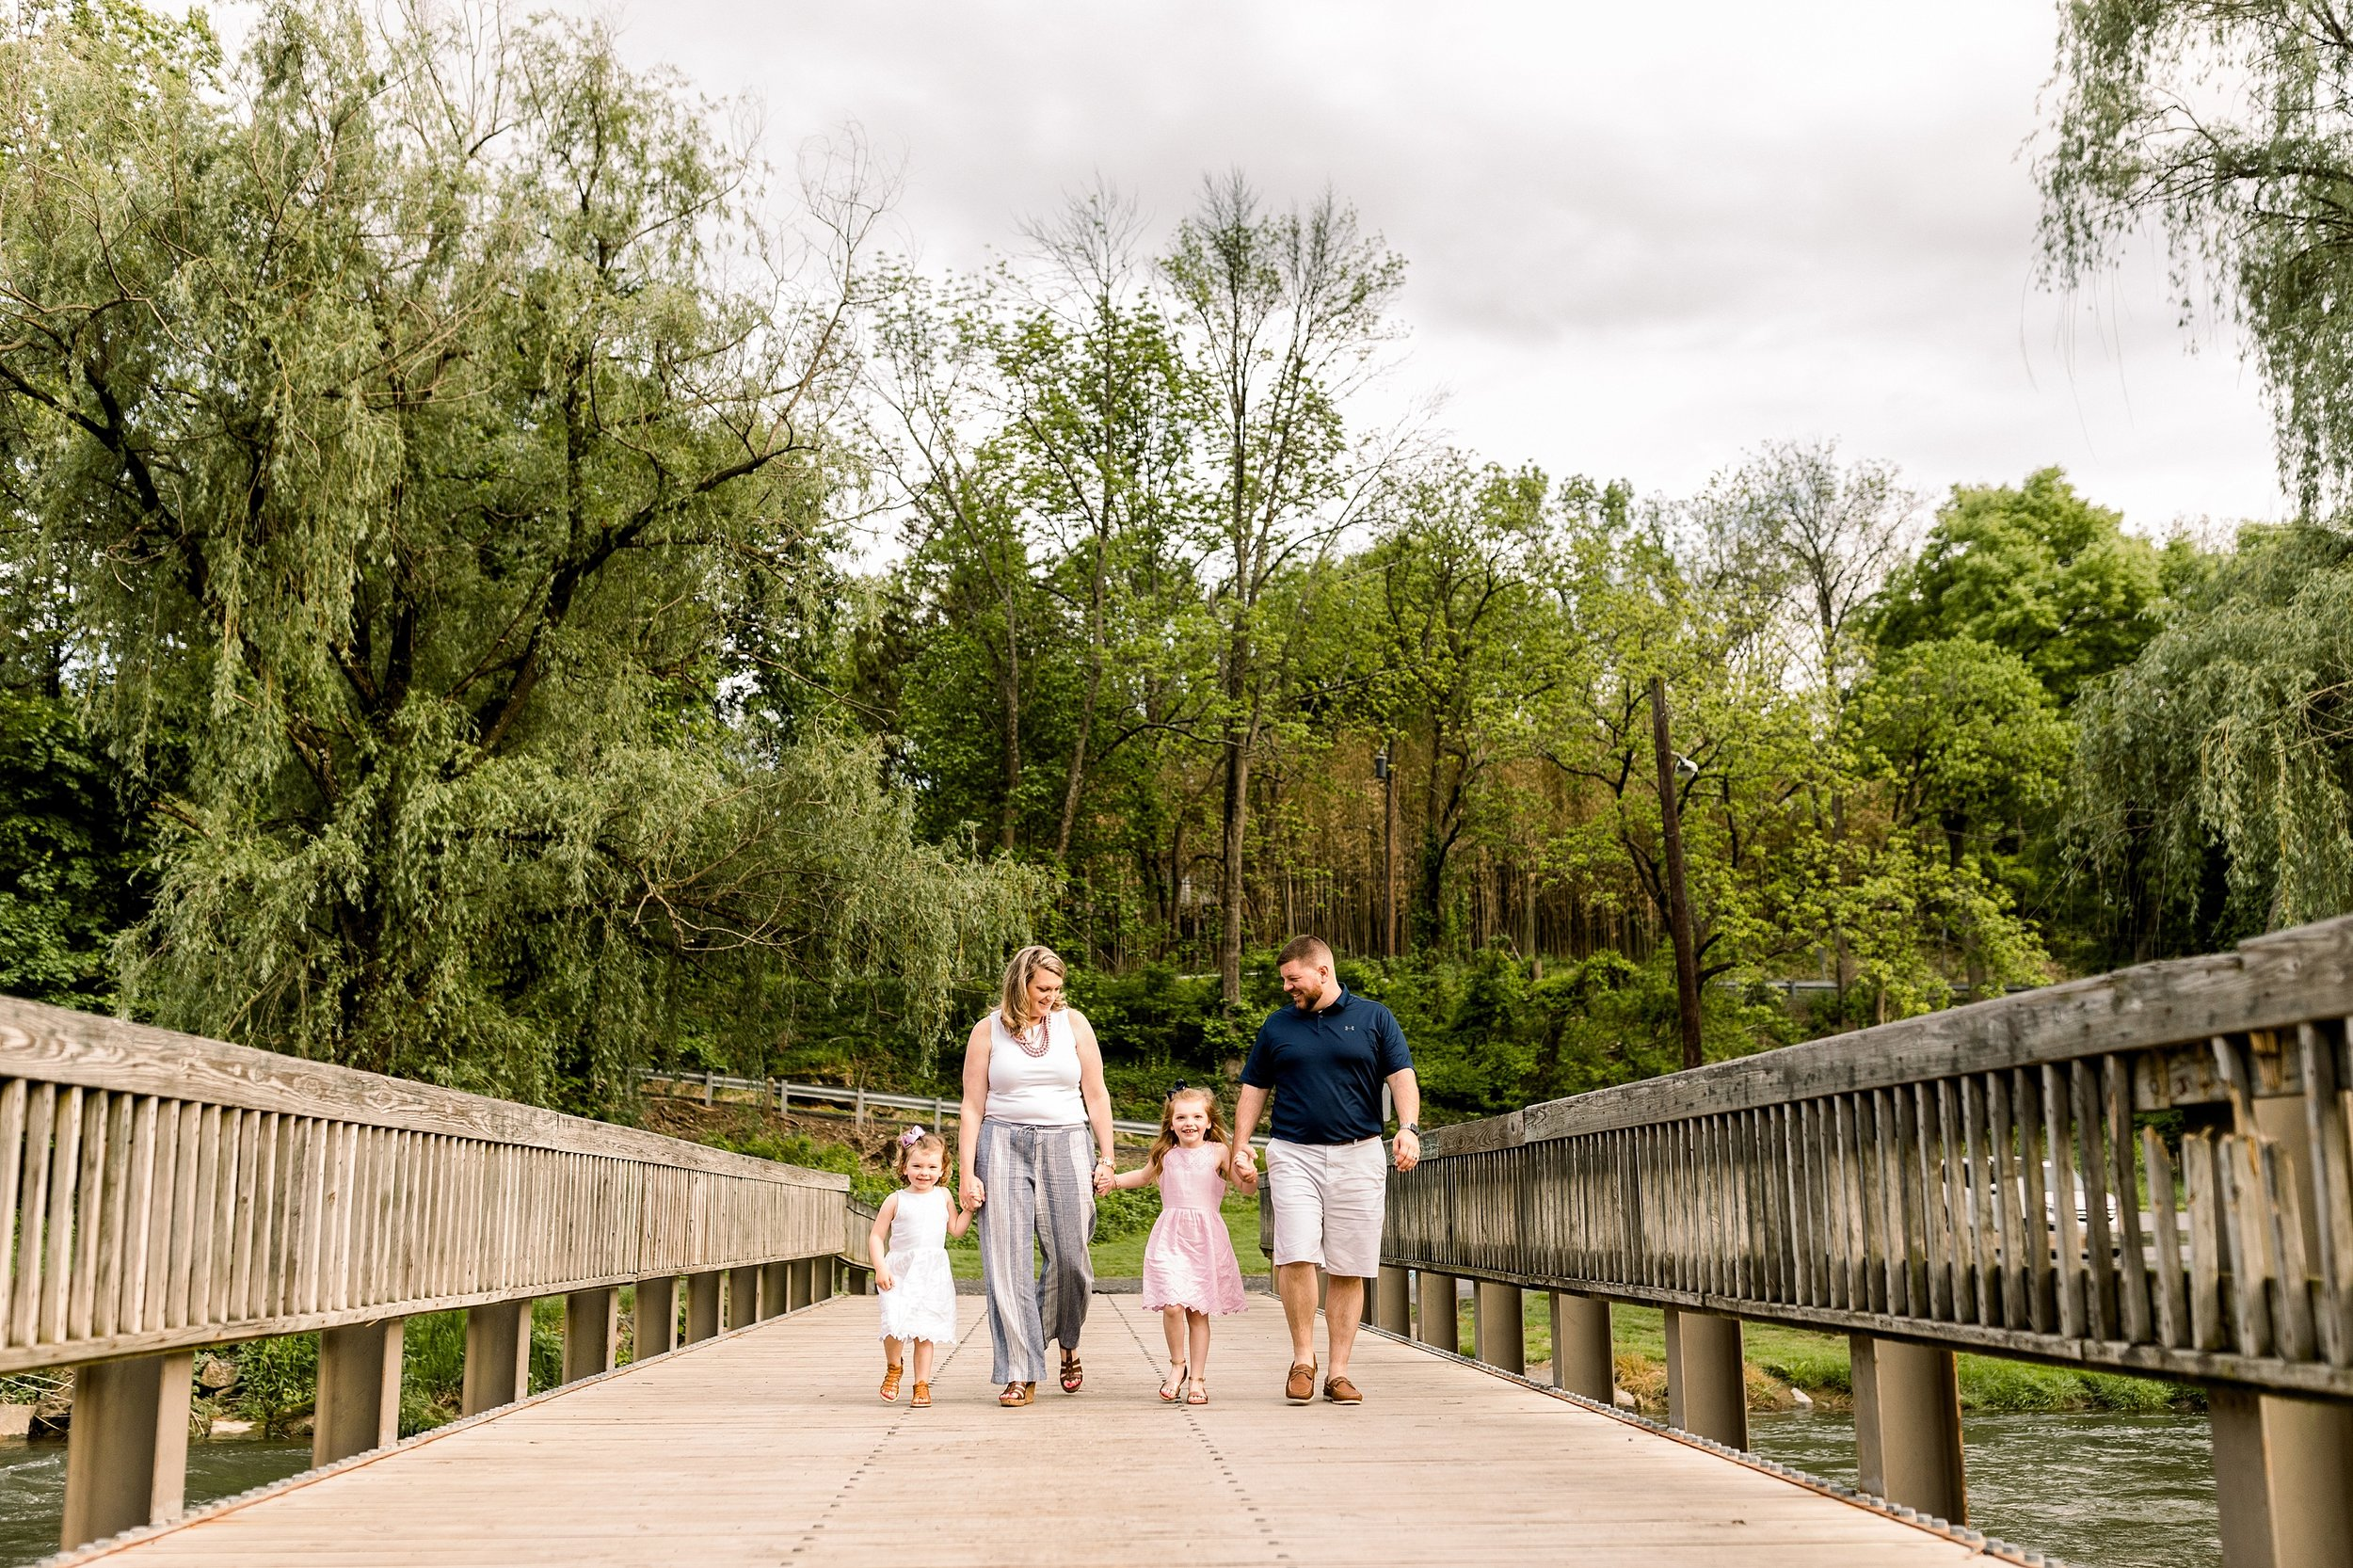 Lehigh-Valley-Family-Photographer_0025.jpg